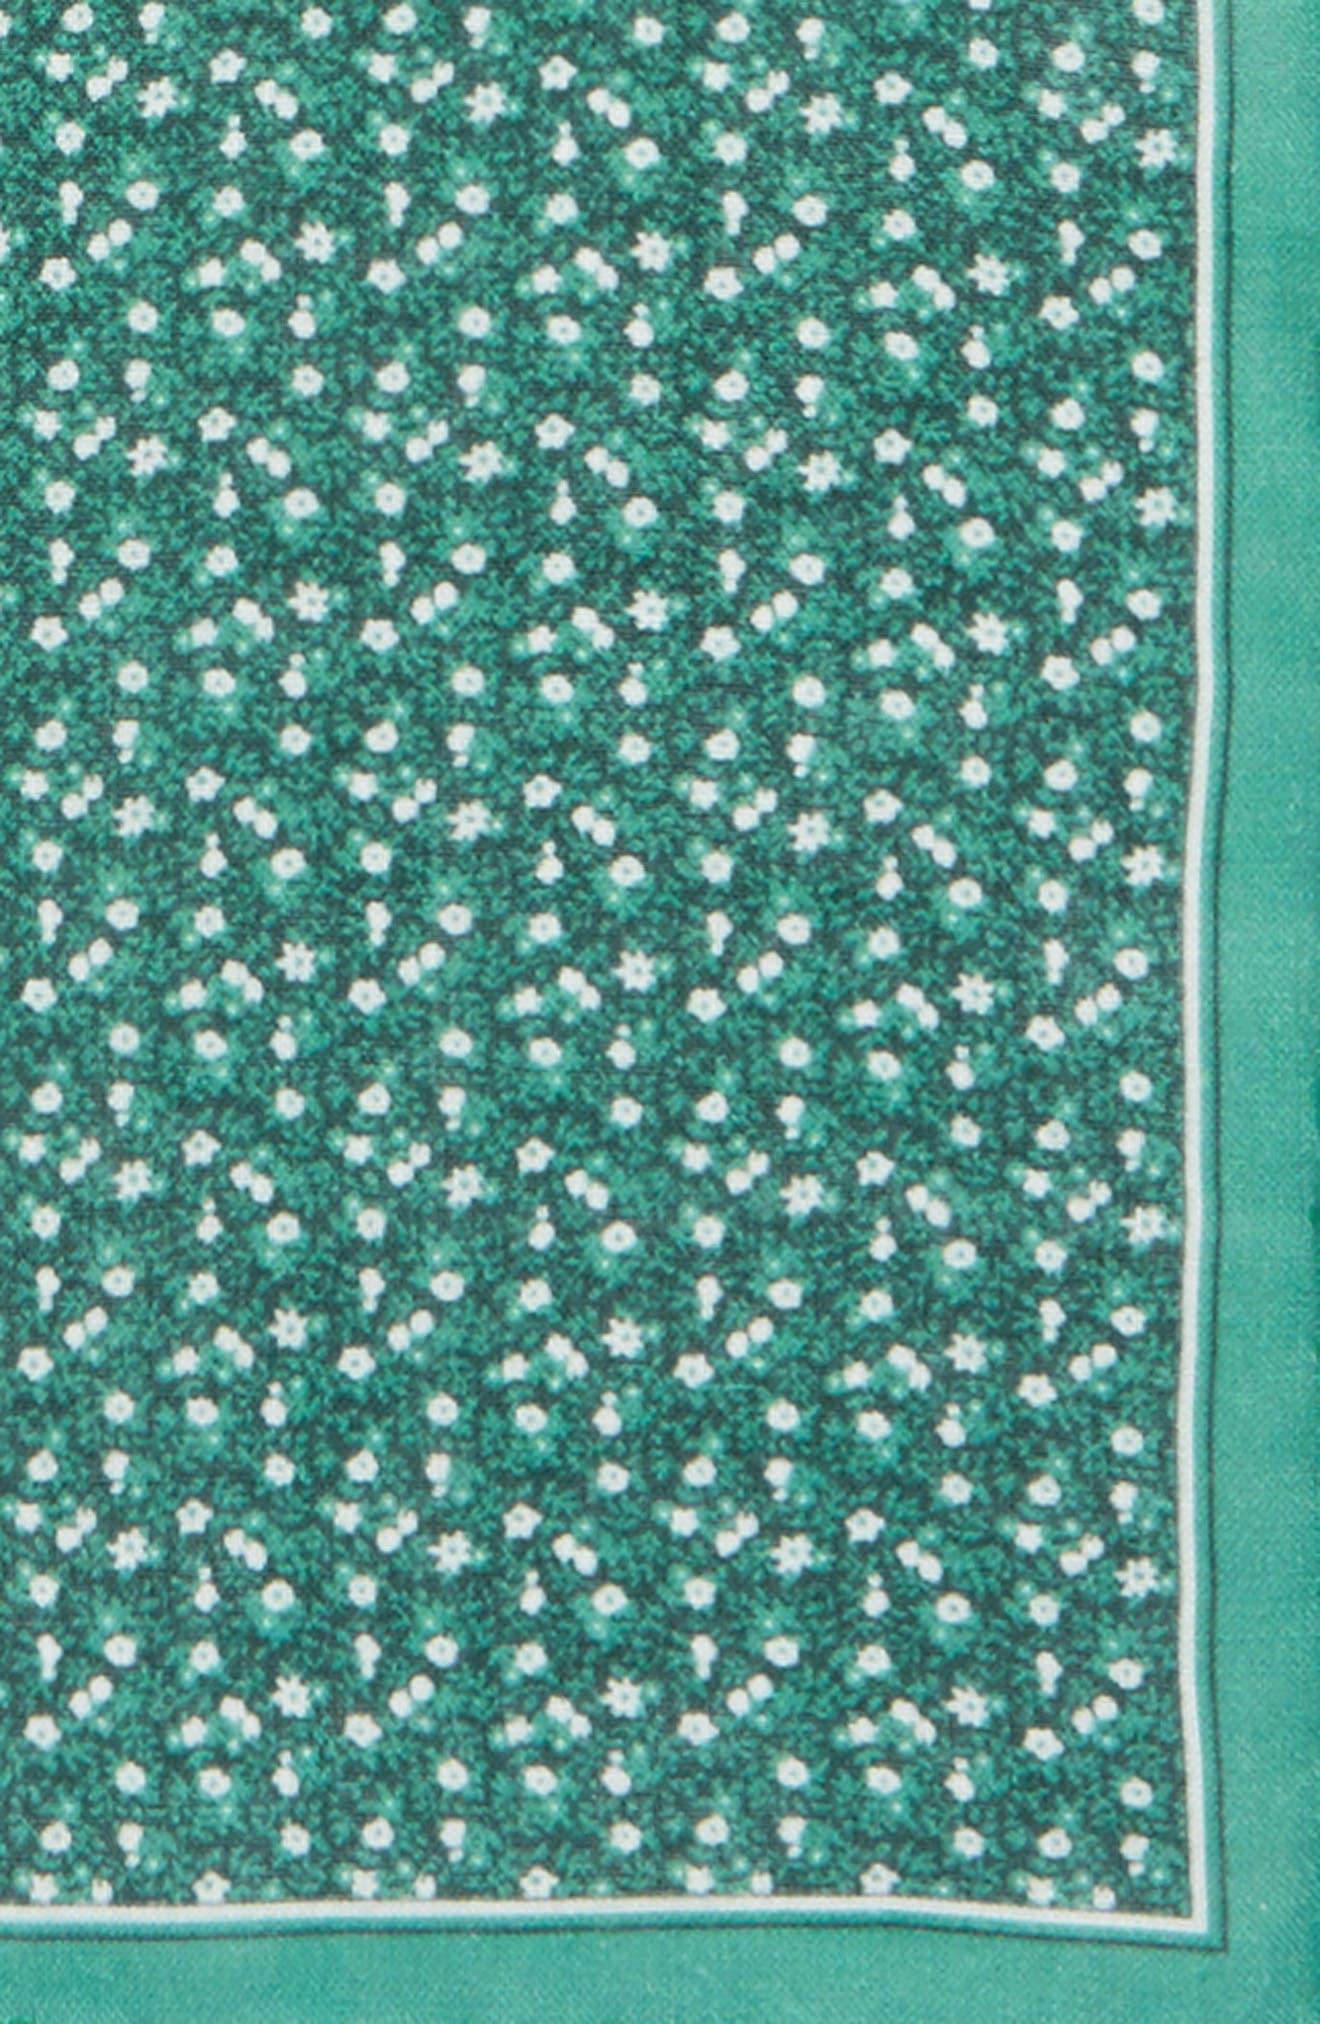 Floral Mark Linen Pocket Square,                             Alternate thumbnail 3, color,                             300